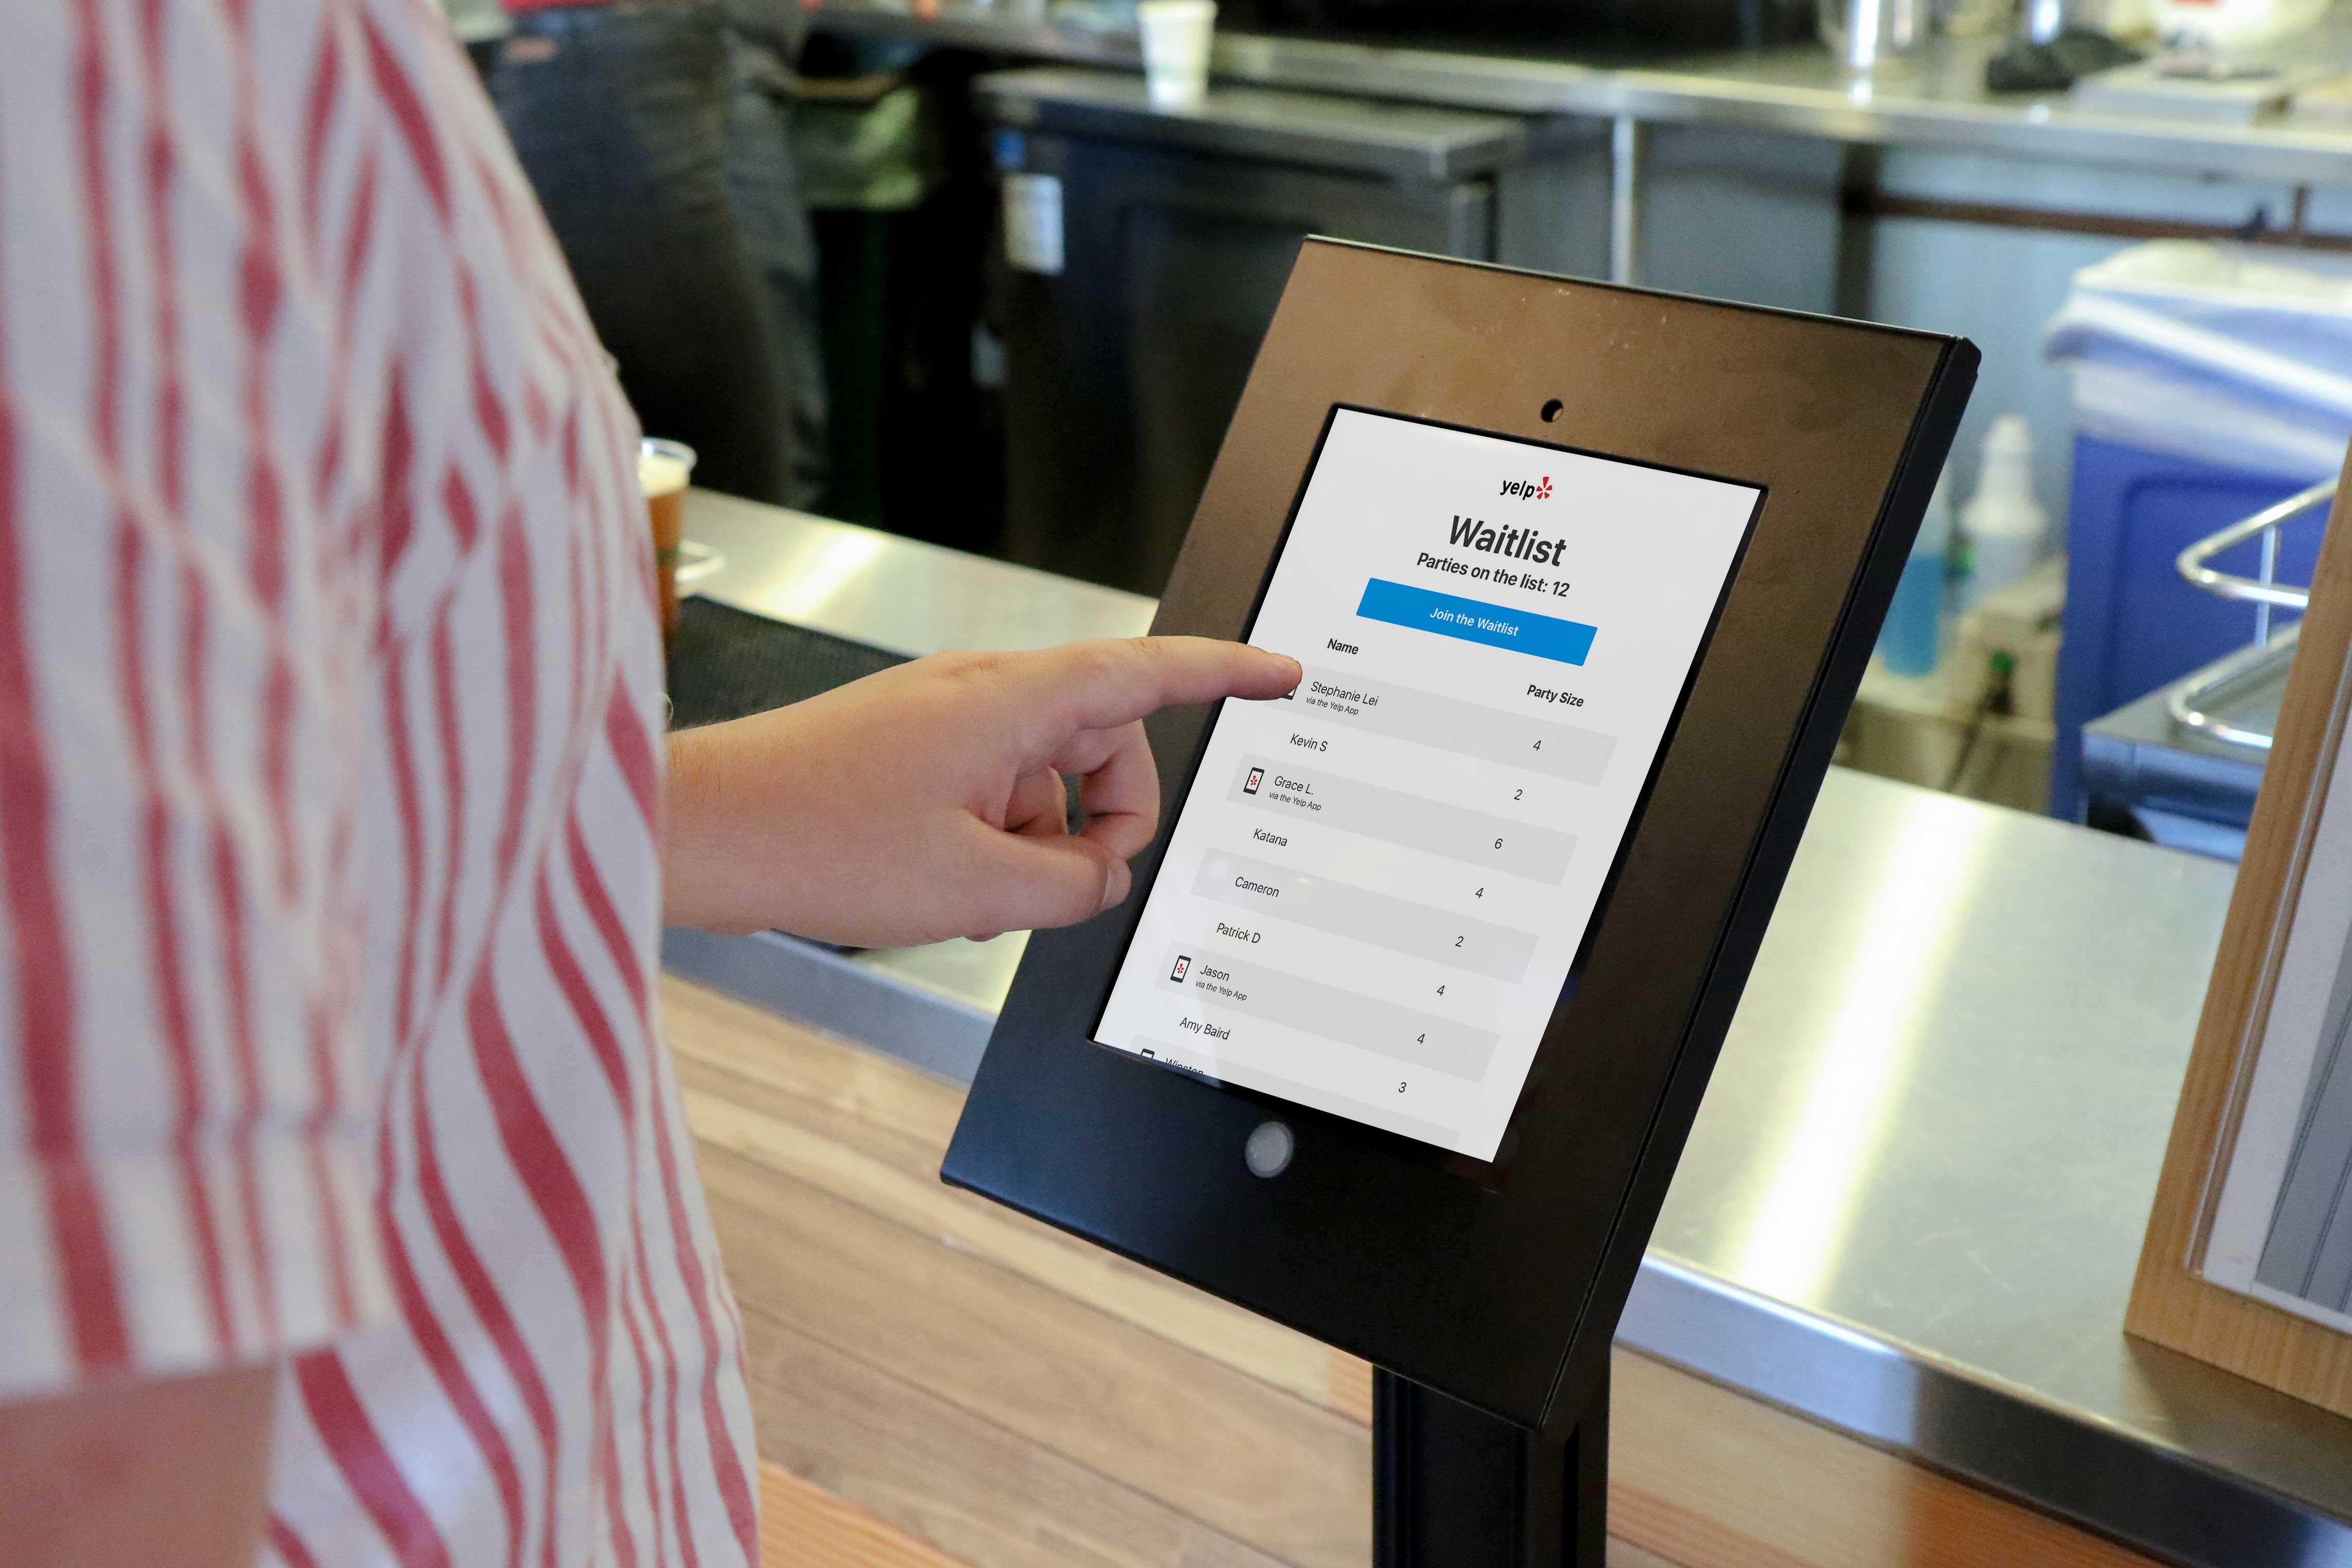 Yelp Grabs More Restaurant Reservations in OpenTable Challenge